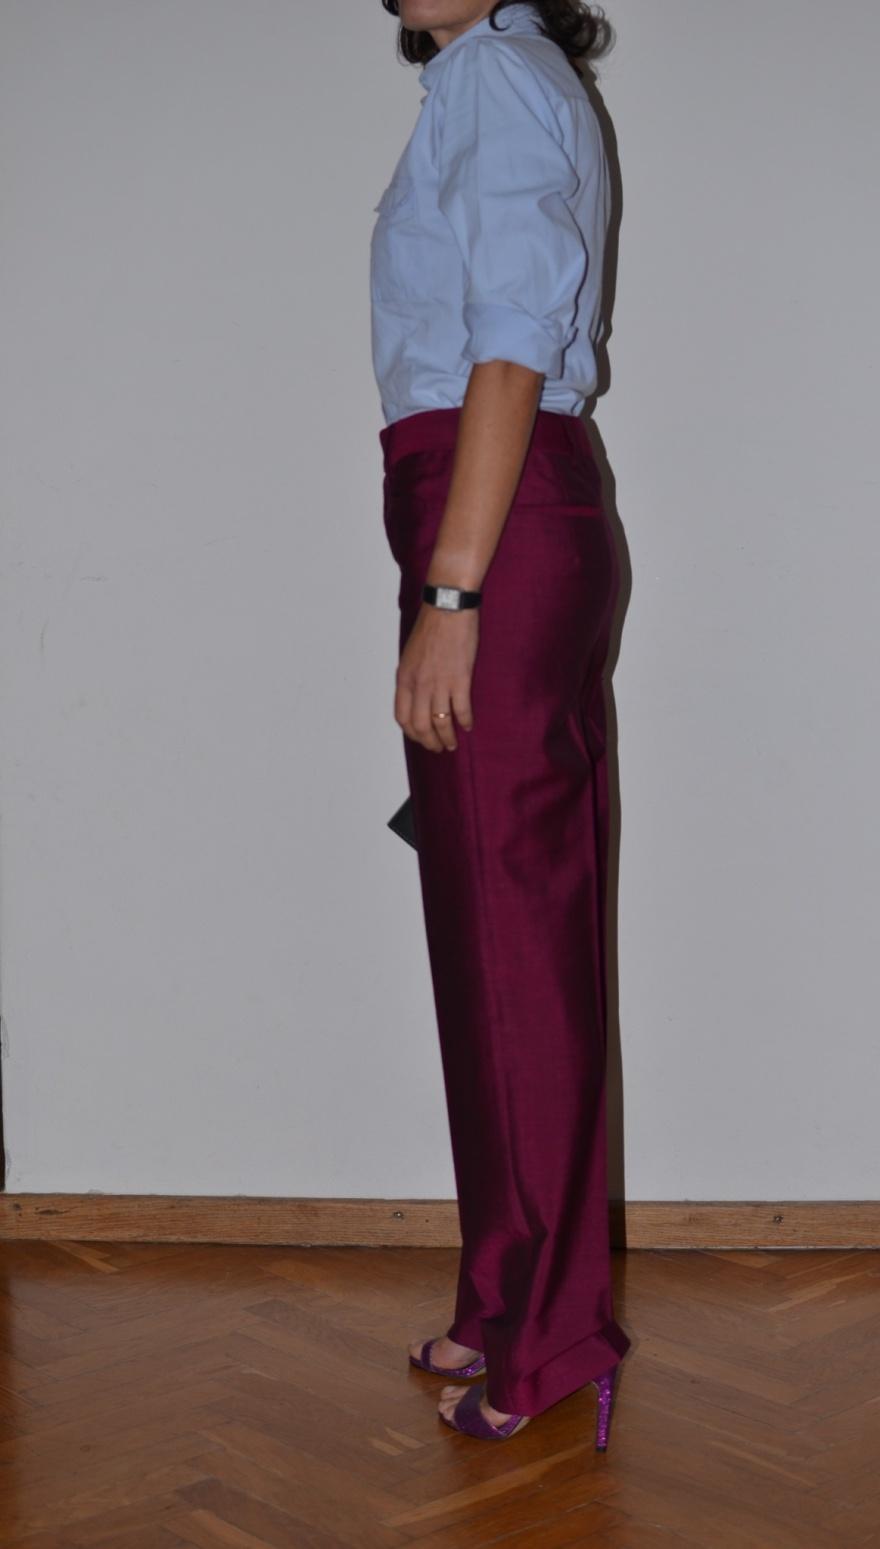 Fashion blogger, new outfit fashion blogger, Prada pants, pantaloni viola, vintage shirt, camicia celeste, asos shoes, Pieces bag, Anastasia style, Florence, working outfit,